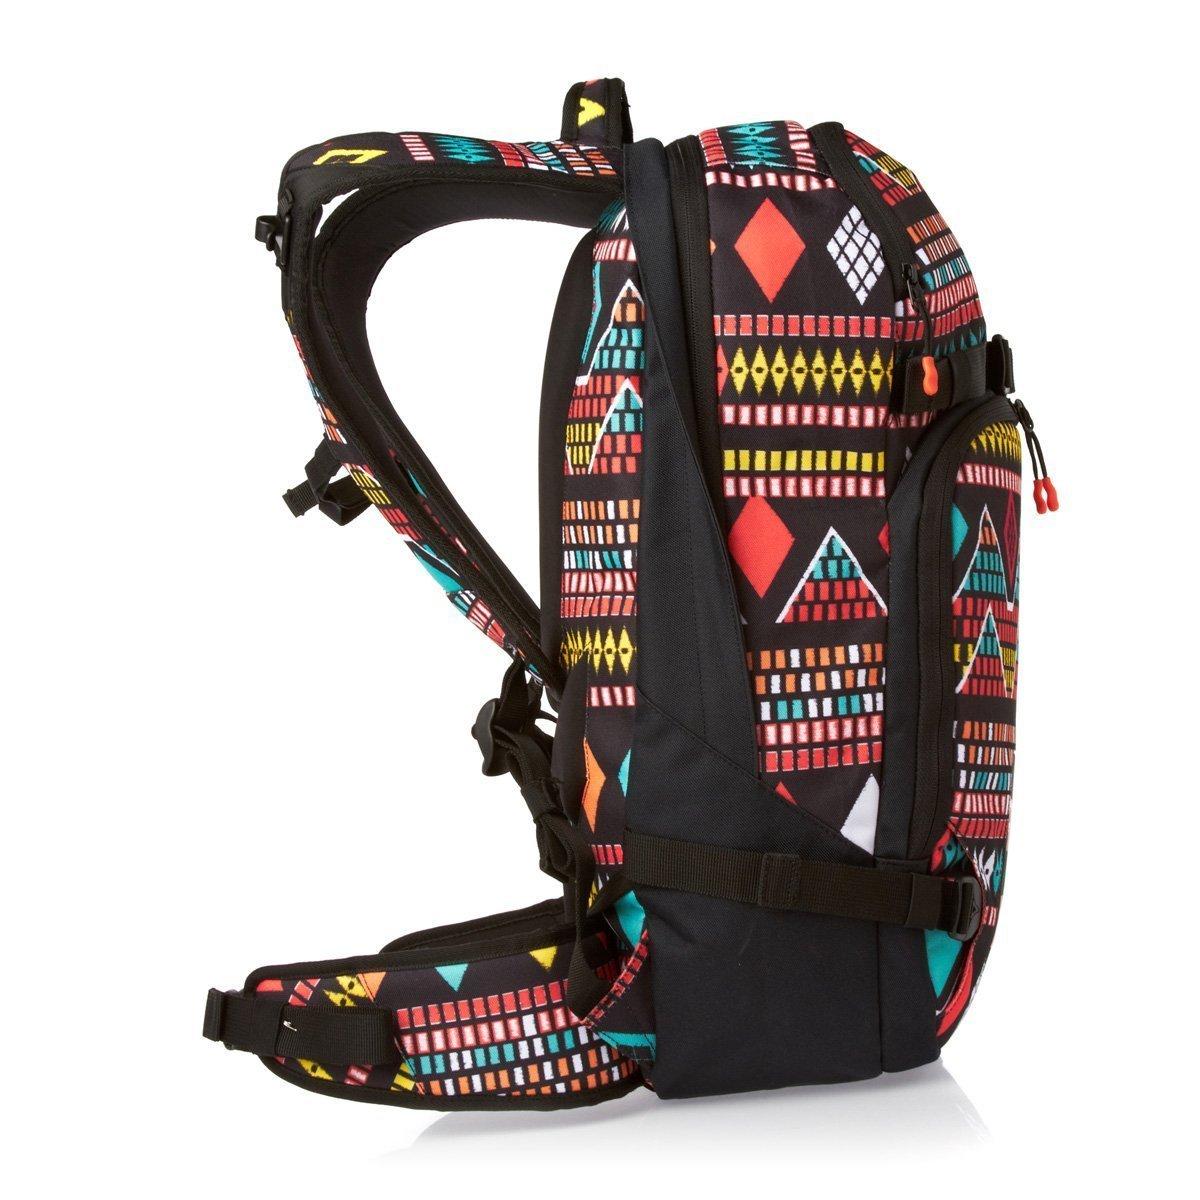 Plecak Roxy Tribute Backpack Indies wielokolorowy bok